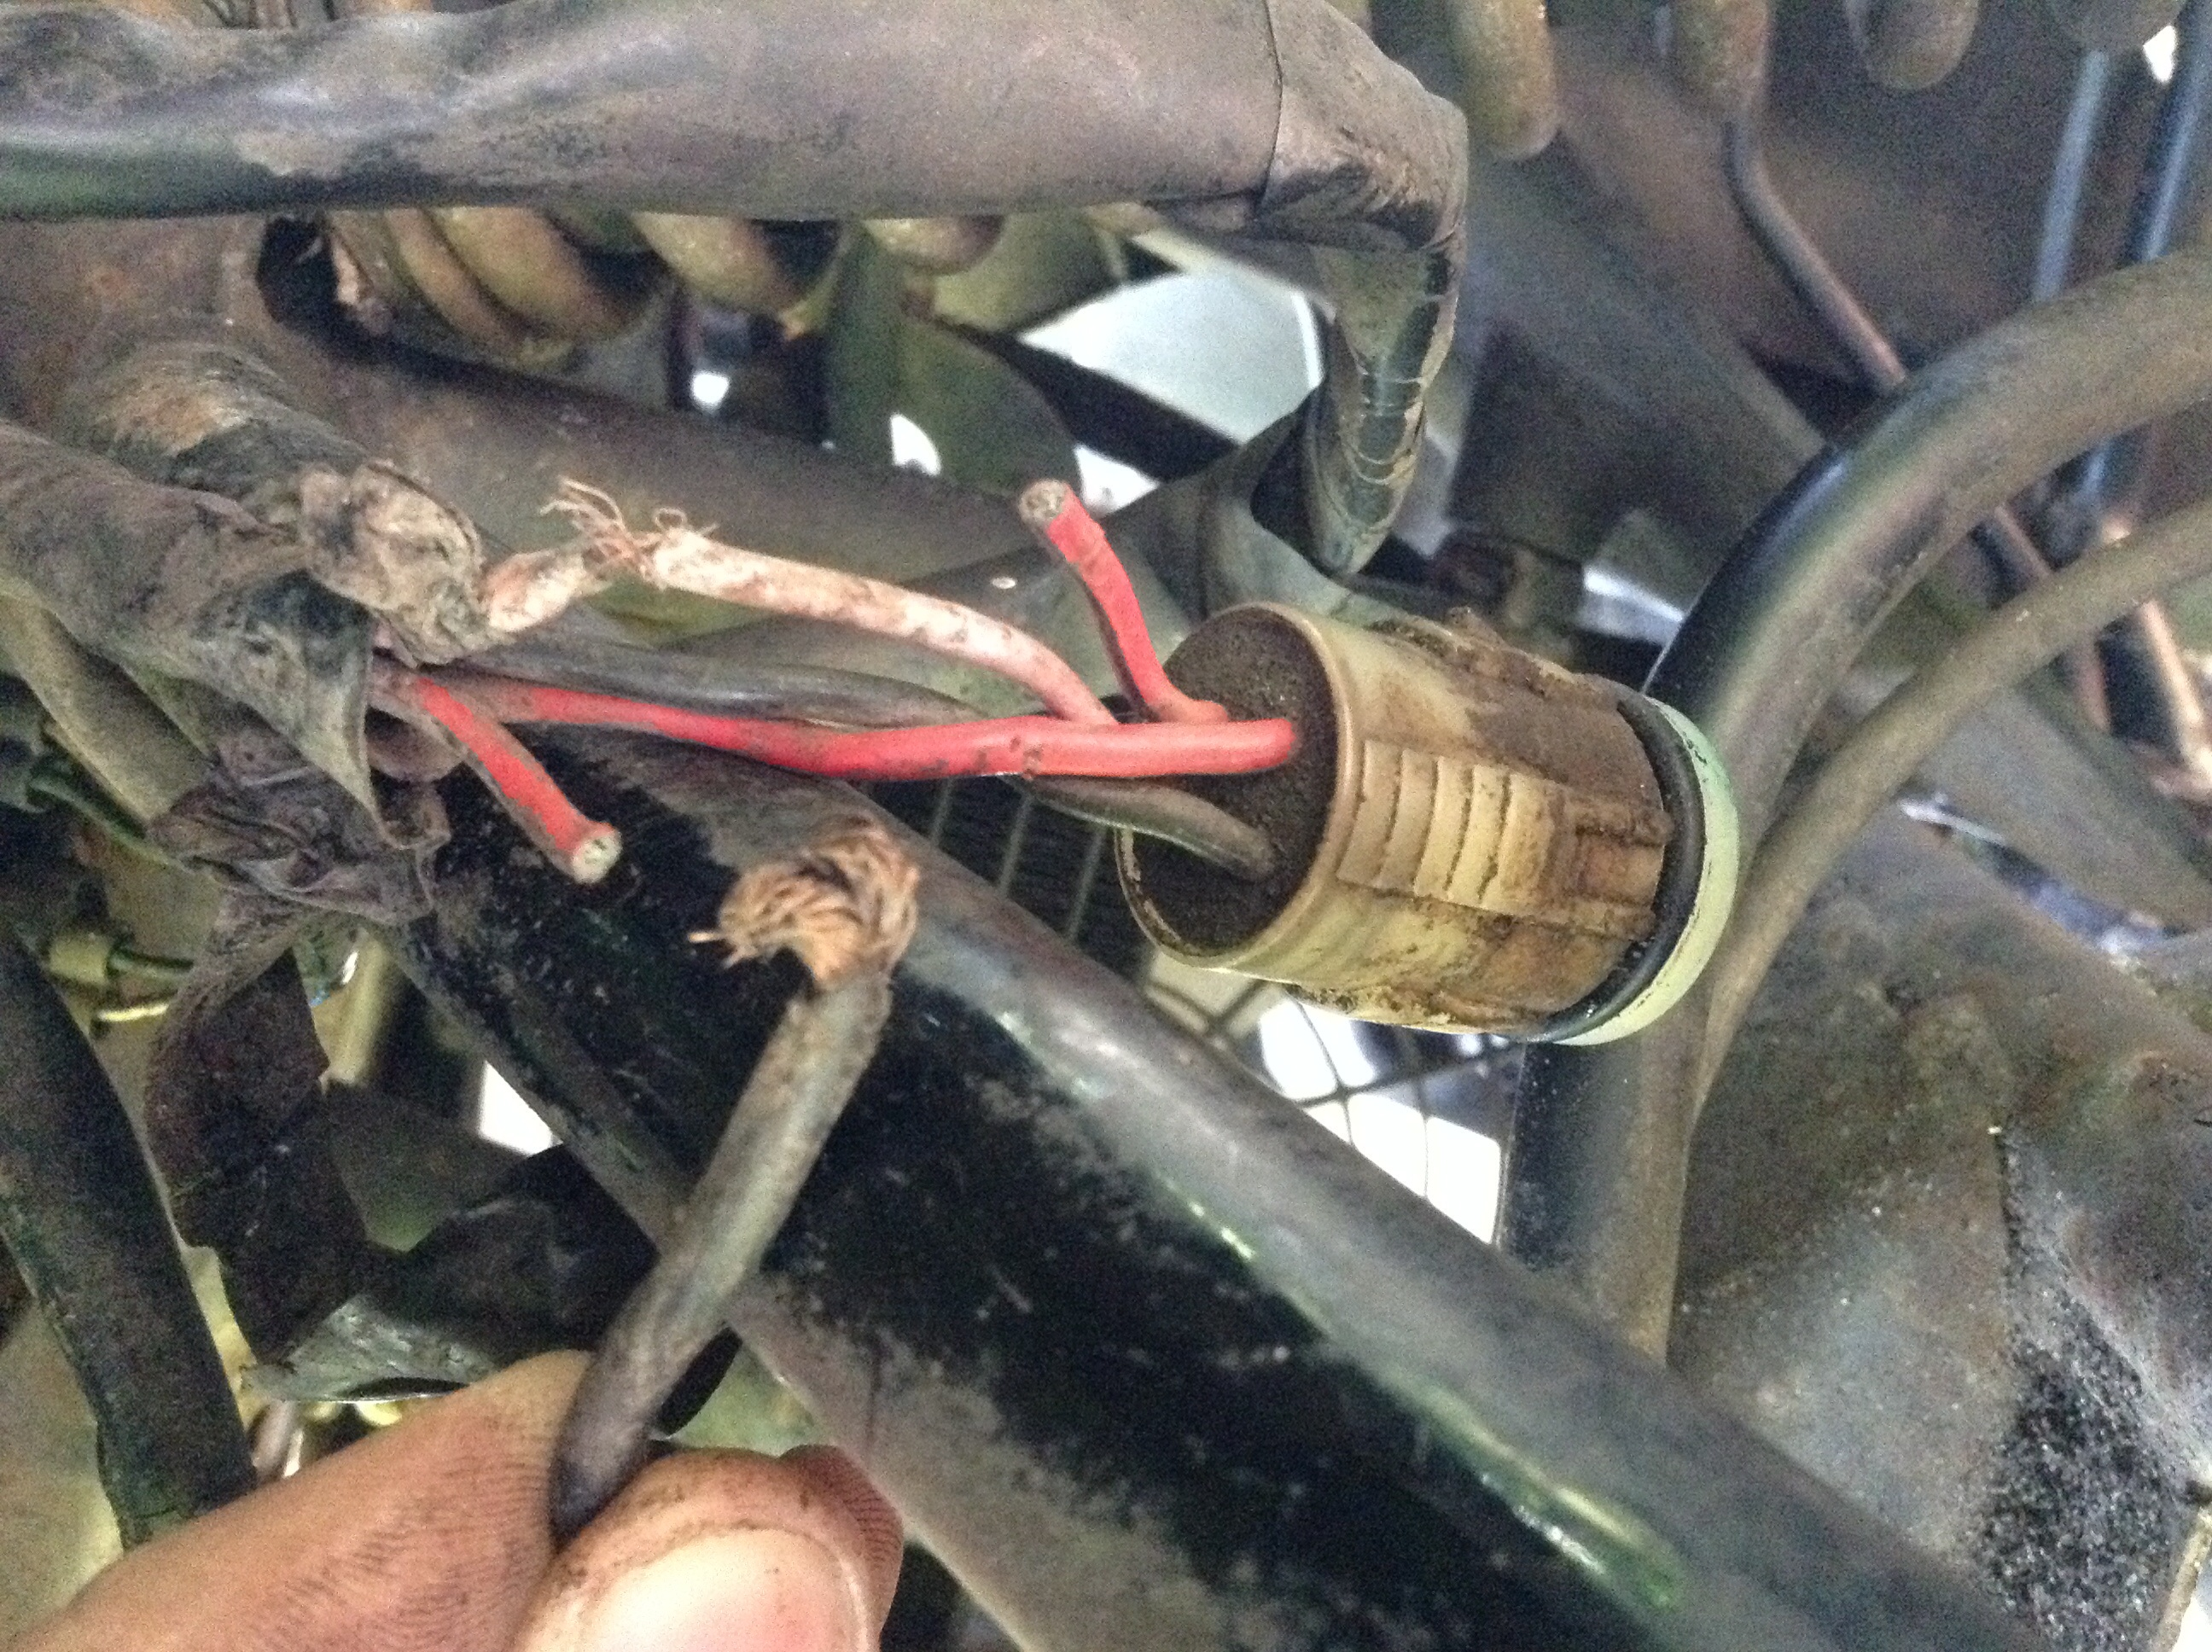 Honda Rancher Starter Switch Wiring Expert Category Circuit Diagram 2002 350 01 Es Won T Start Page 3 Atv Forum Rh Hondaatvforums Net Ignition